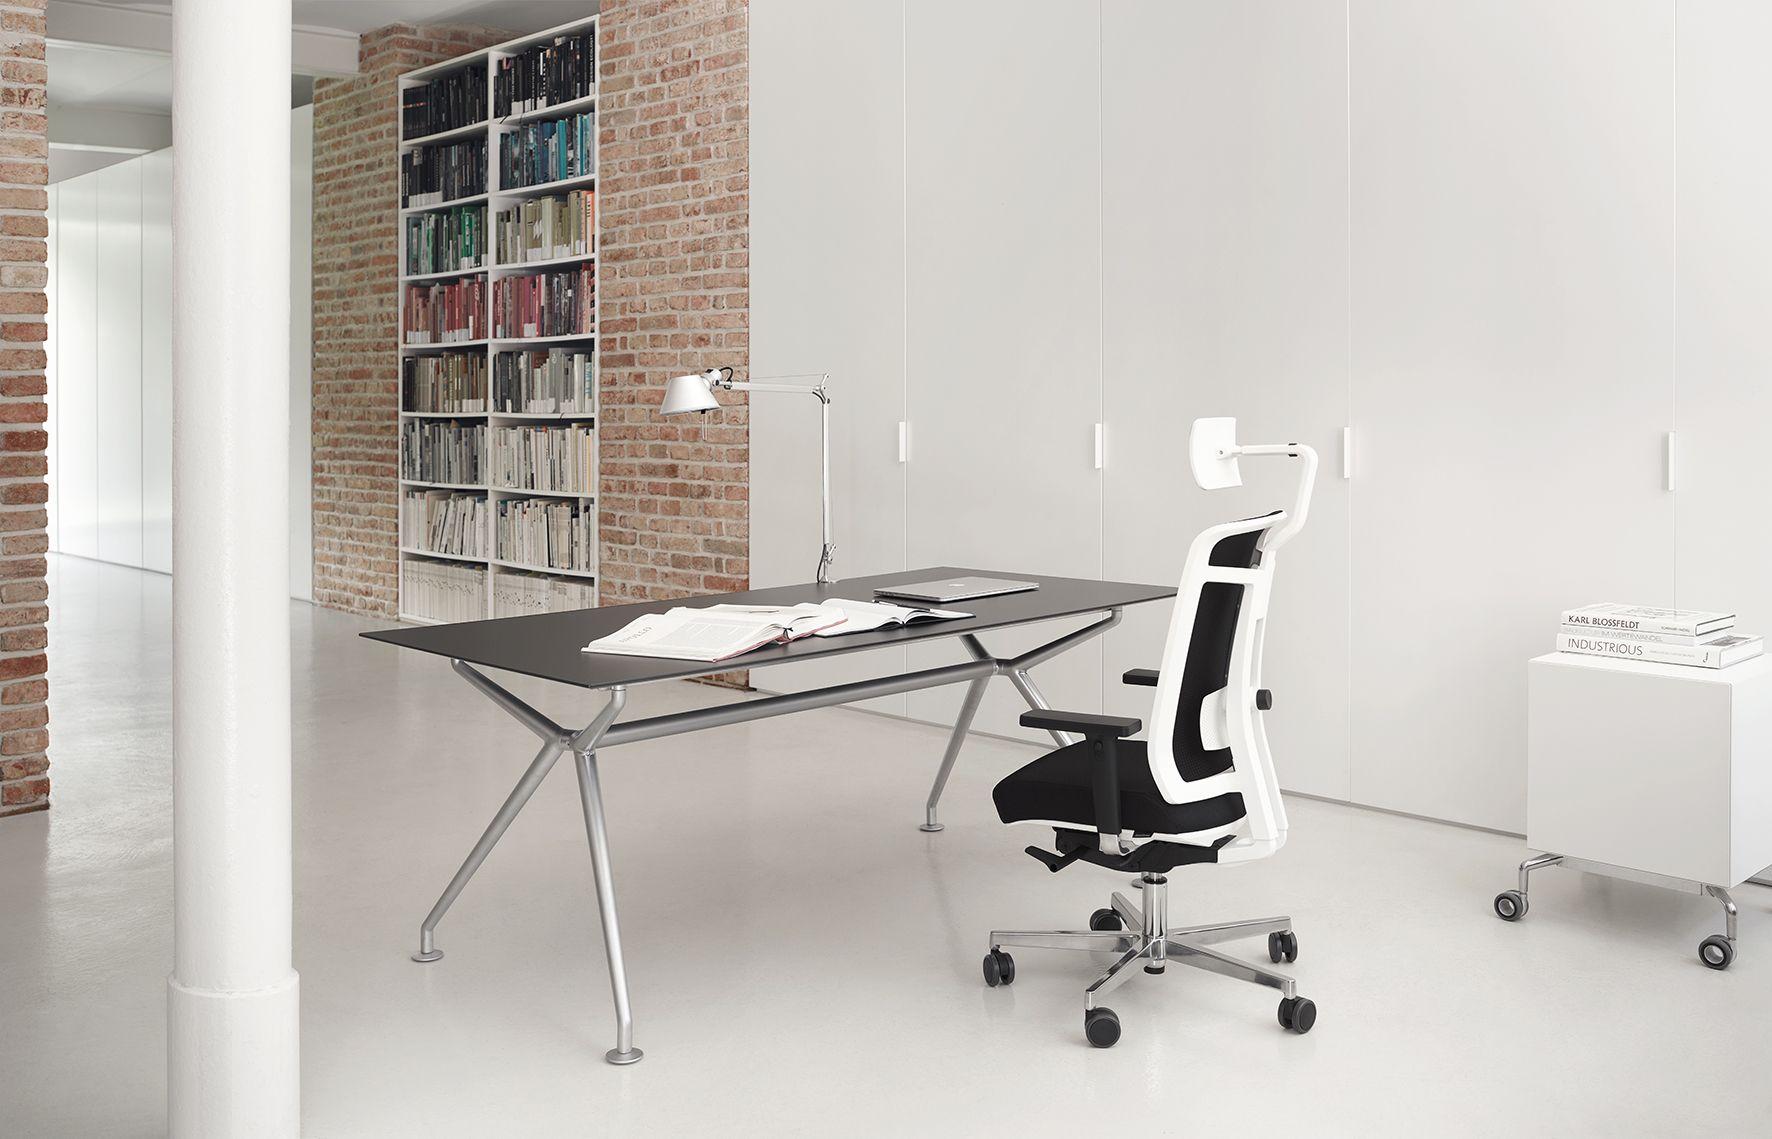 Drehstuhle Sitzmobel Office Objekteinrichtung Buro Wagner Living W7 W Tabel Stuhle Buero Einrichtung